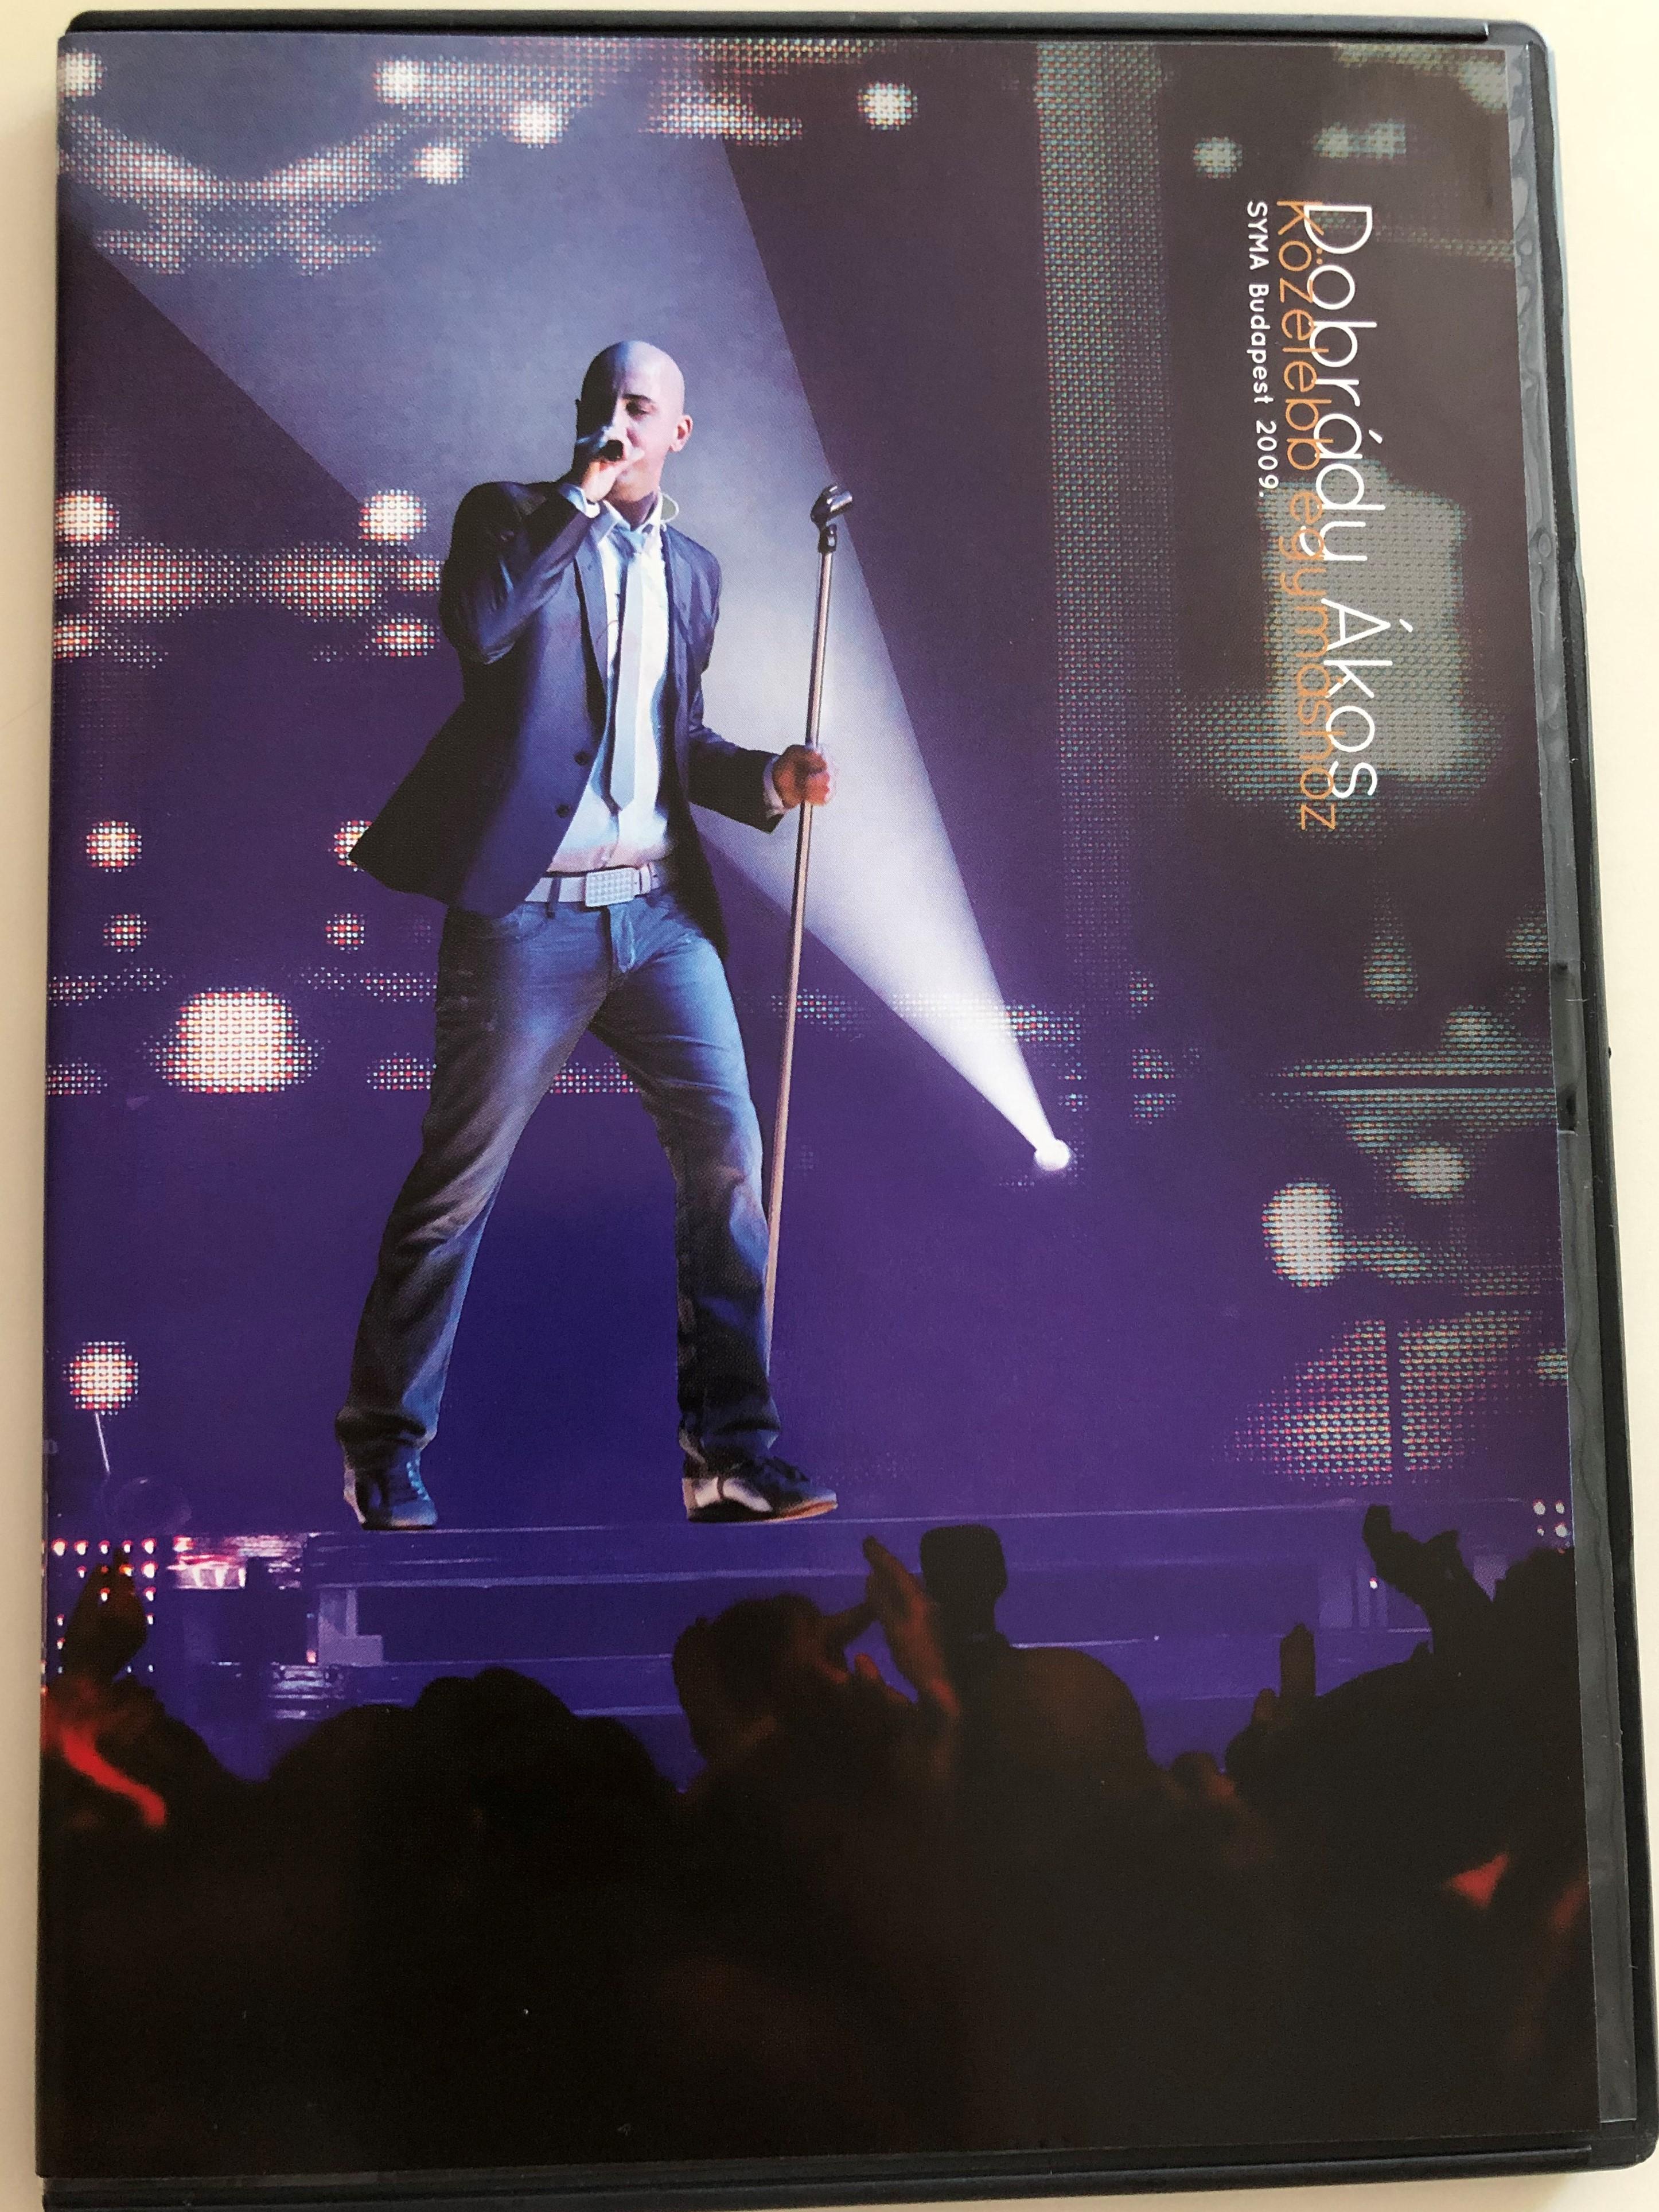 dobr-dy-kos-k-zelebb-egym-shoz-dvd-2010-directed-by-veres-zsolt-2009-live-concert-recording-smr-2010-musicdome-1-.jpg